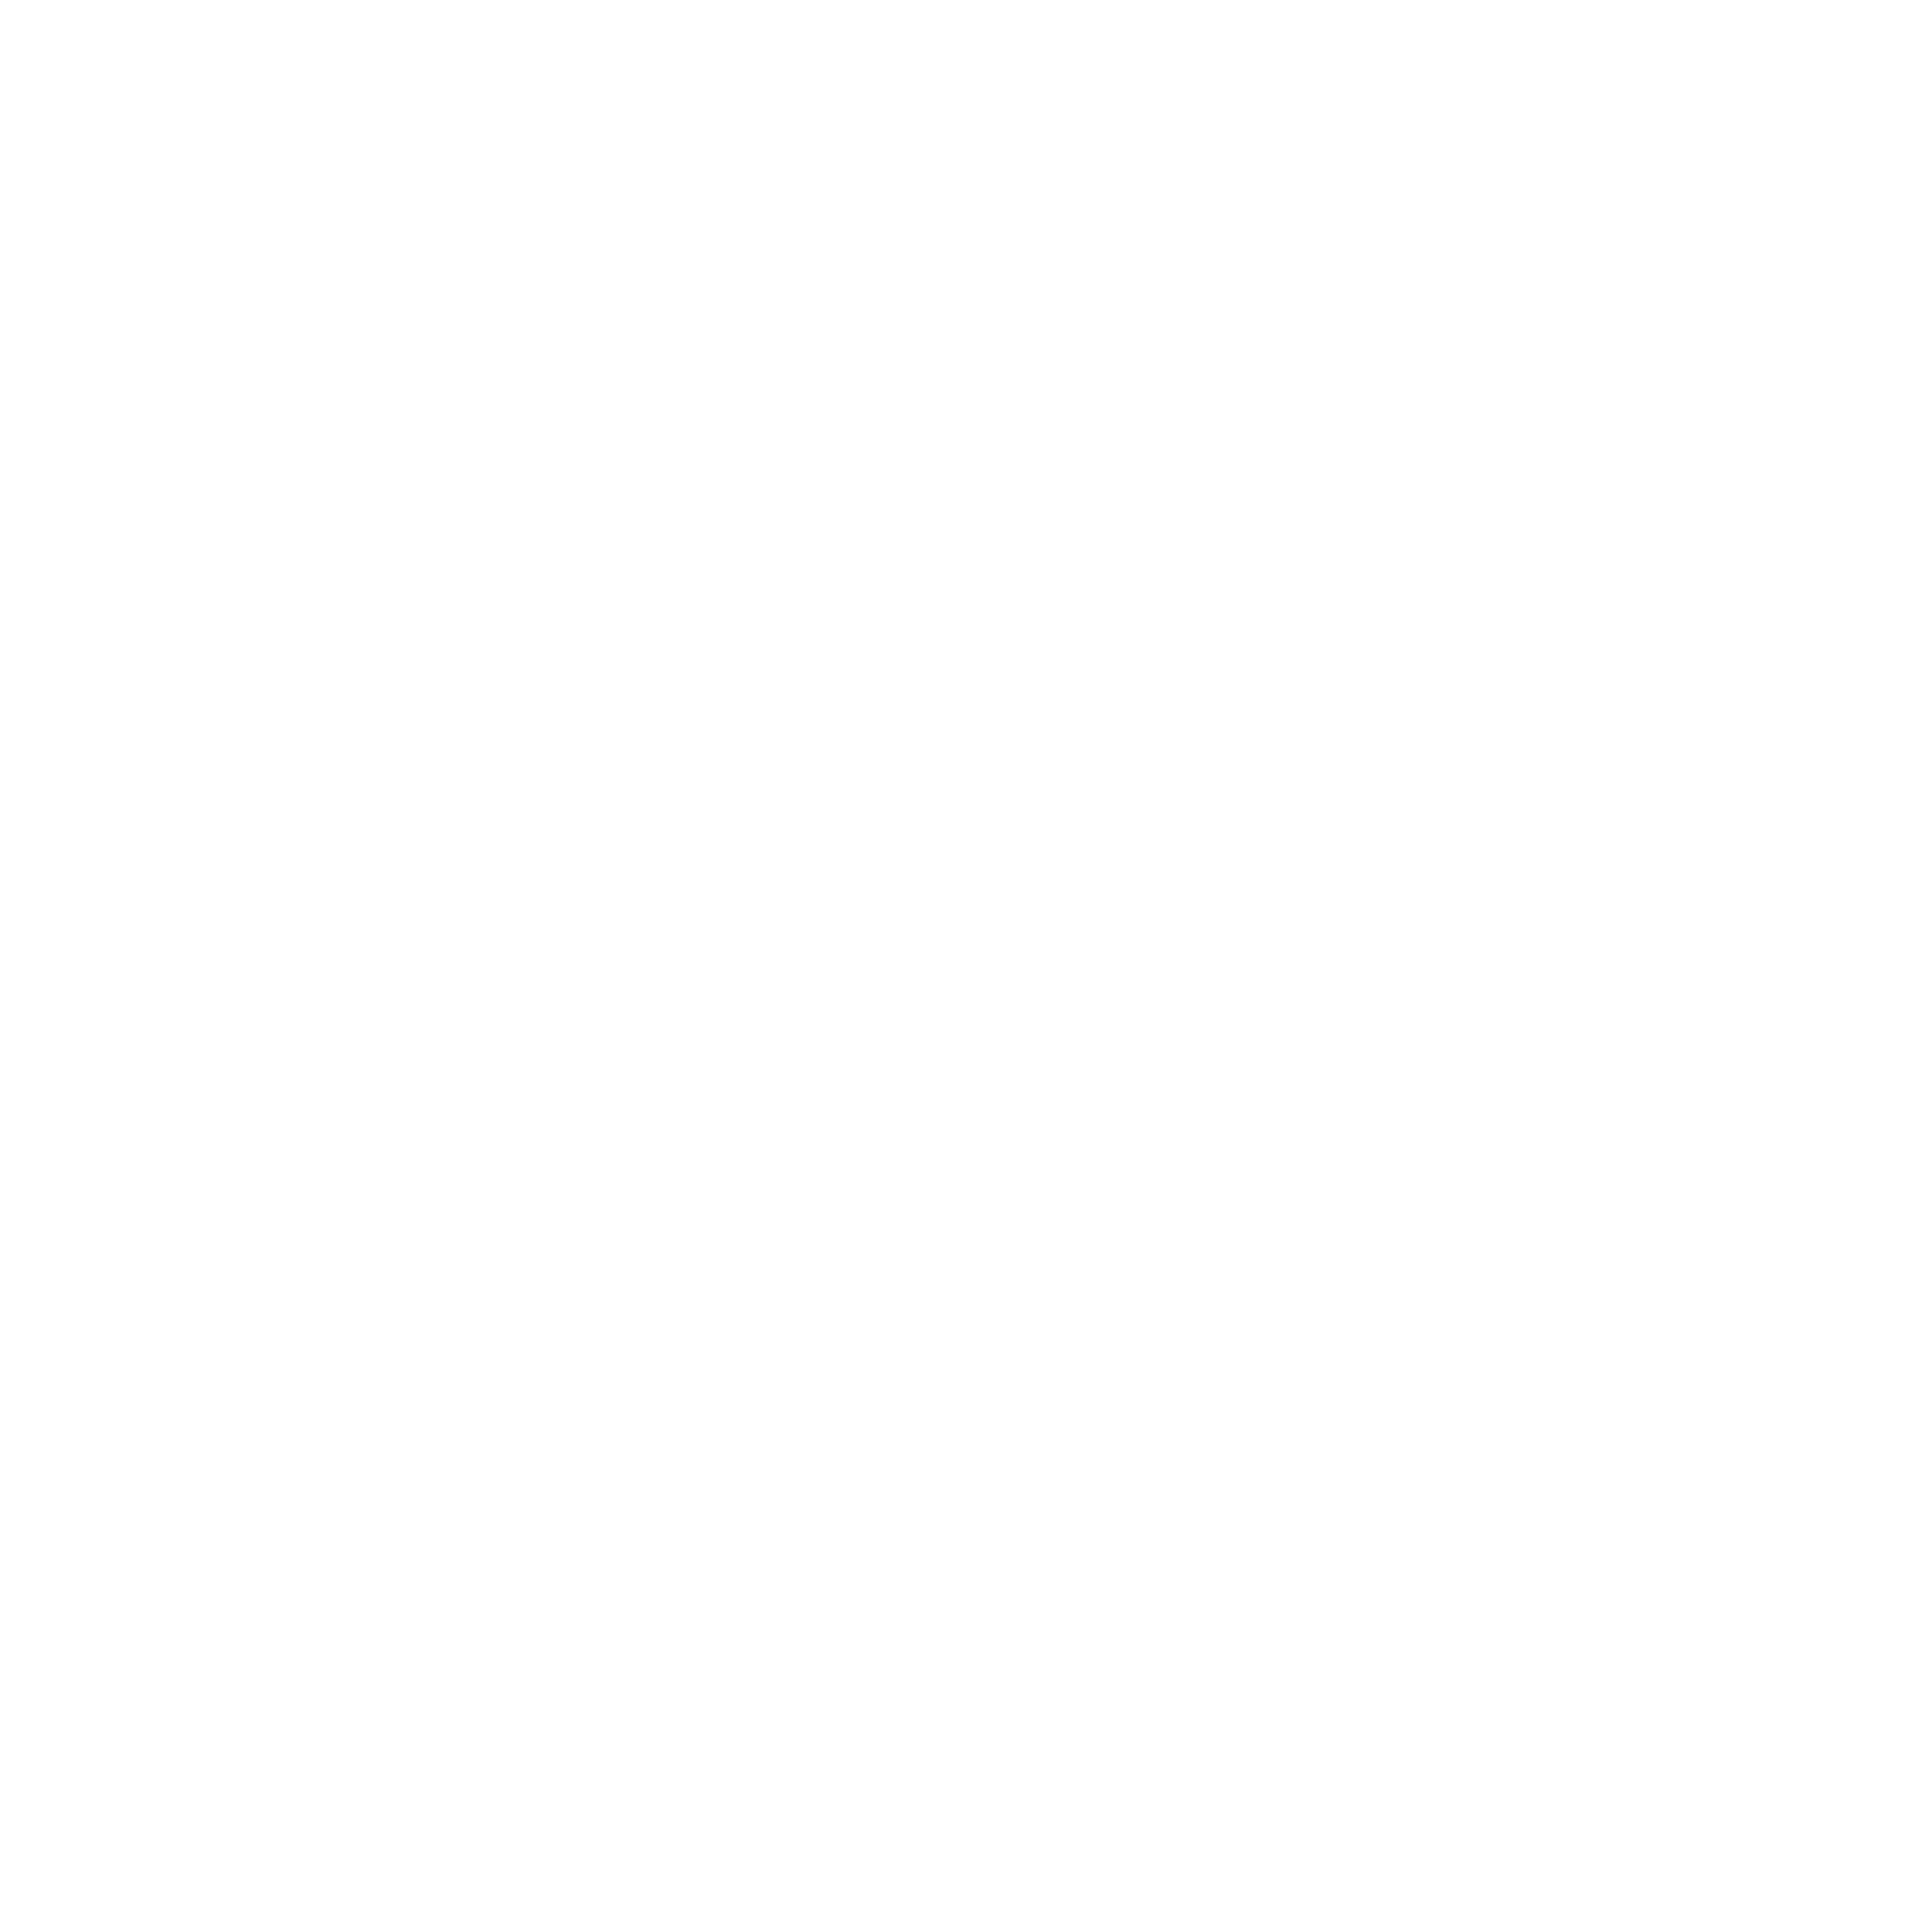 relationshipmatters.PNG